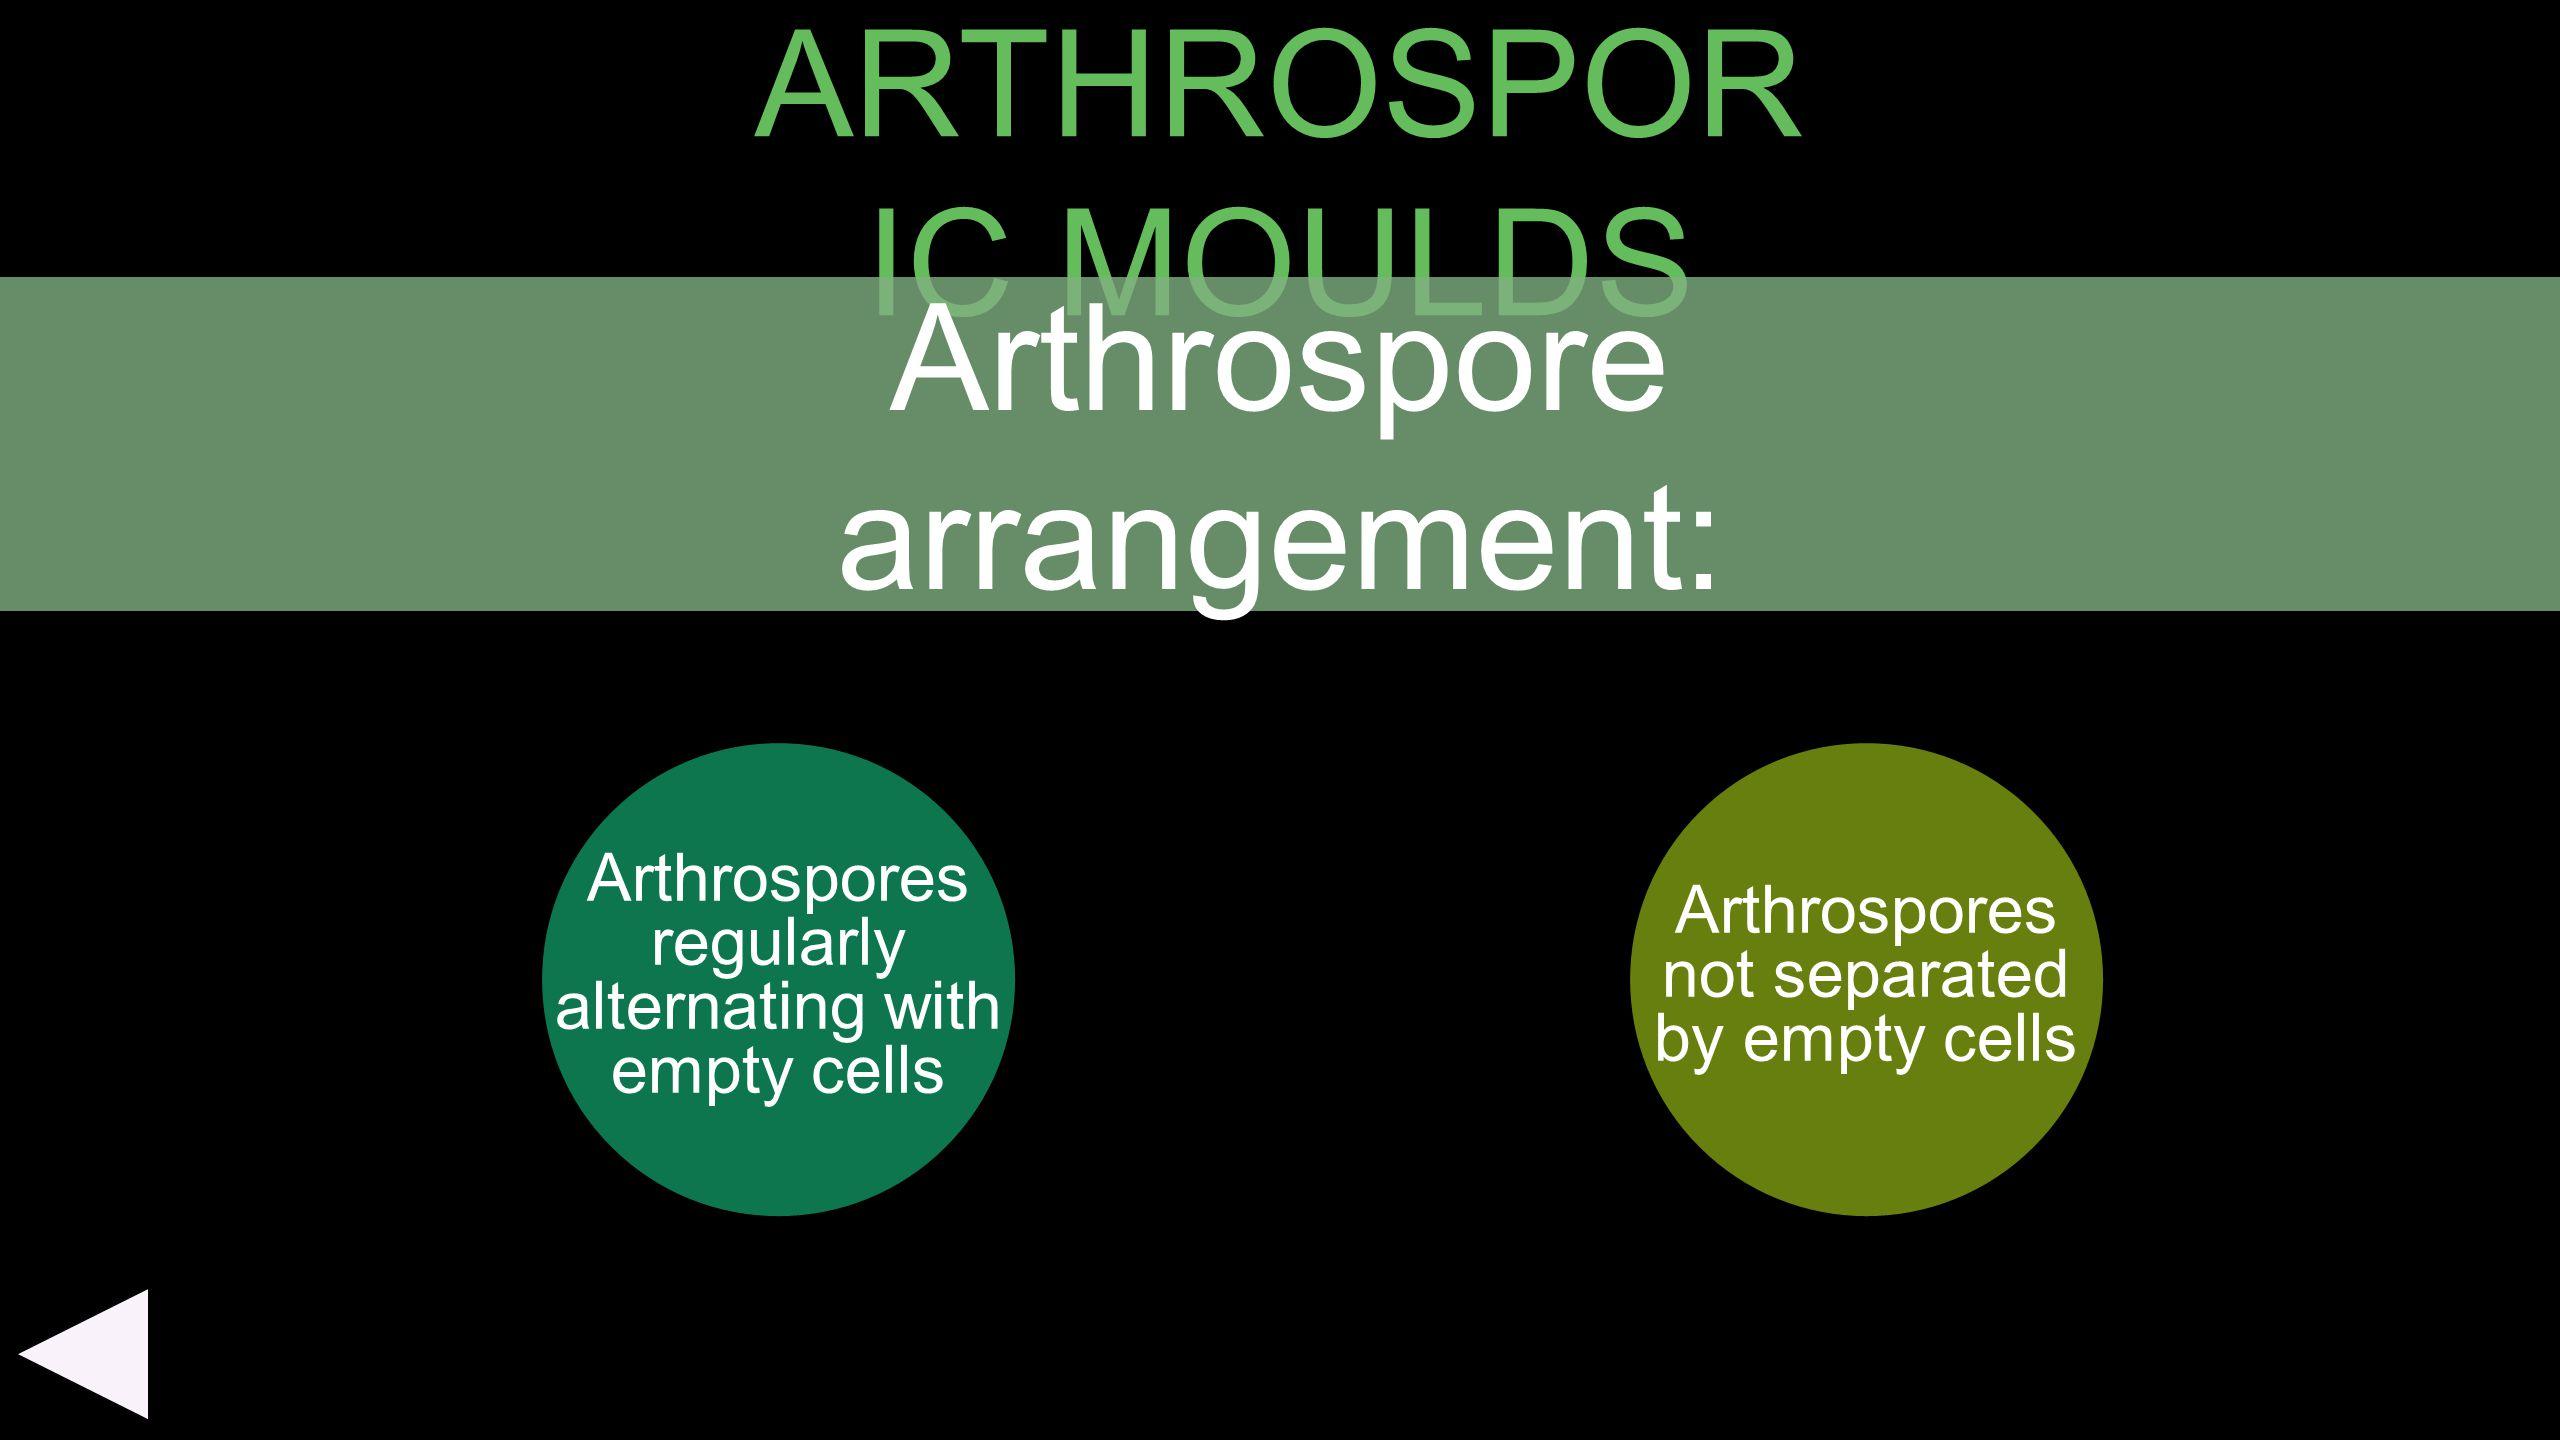 ARTHROSPOR IC MOULDS Arthrospores regularly alternating with empty cells Arthrospores not separated by empty cells Arthrospore arrangement: